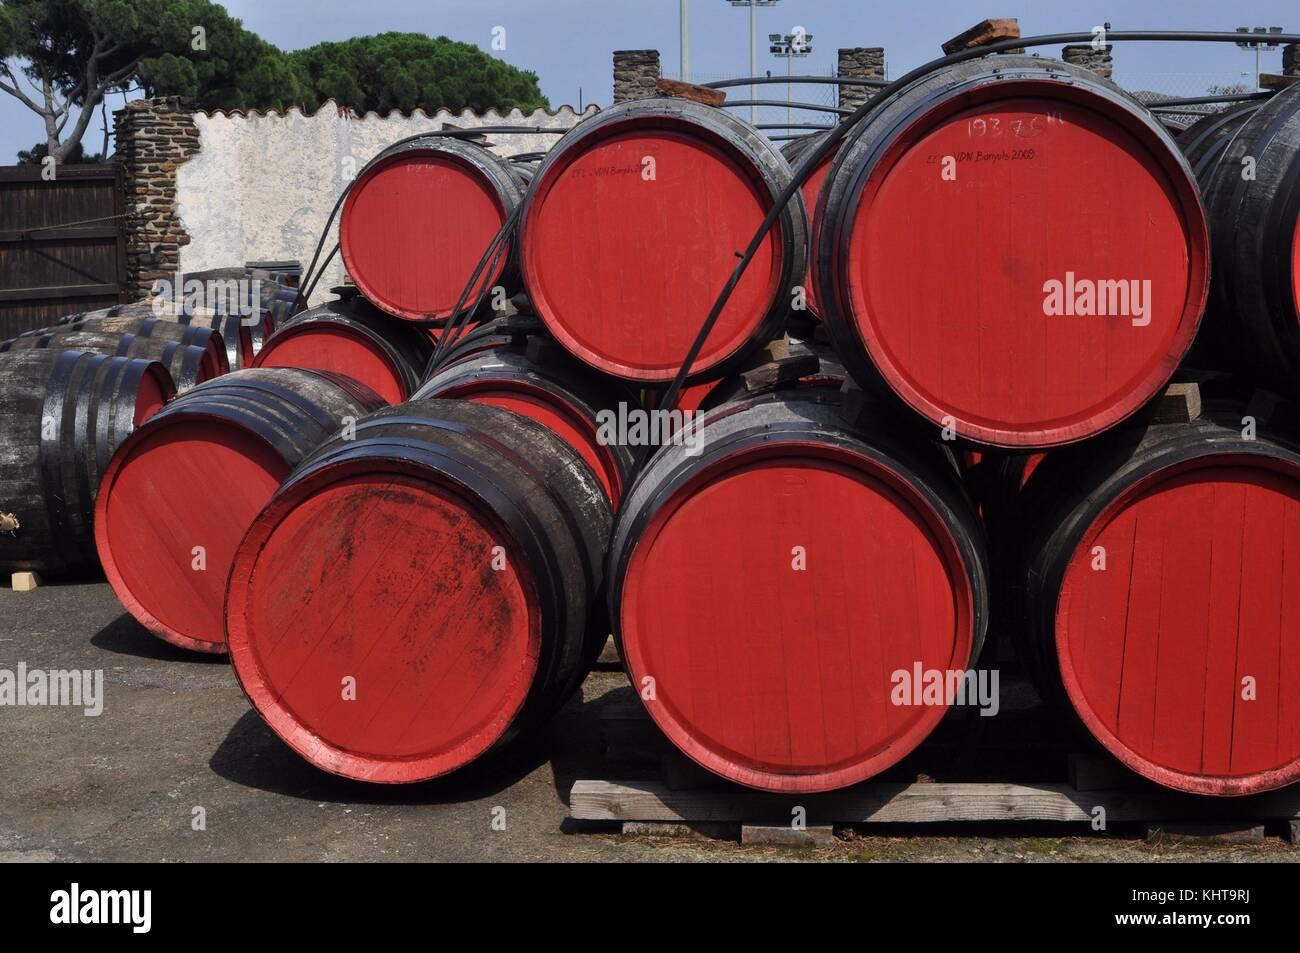 BARRELS OF WINE, LE TEMPLIERS, BANYULS, FRANCE - Stock Image